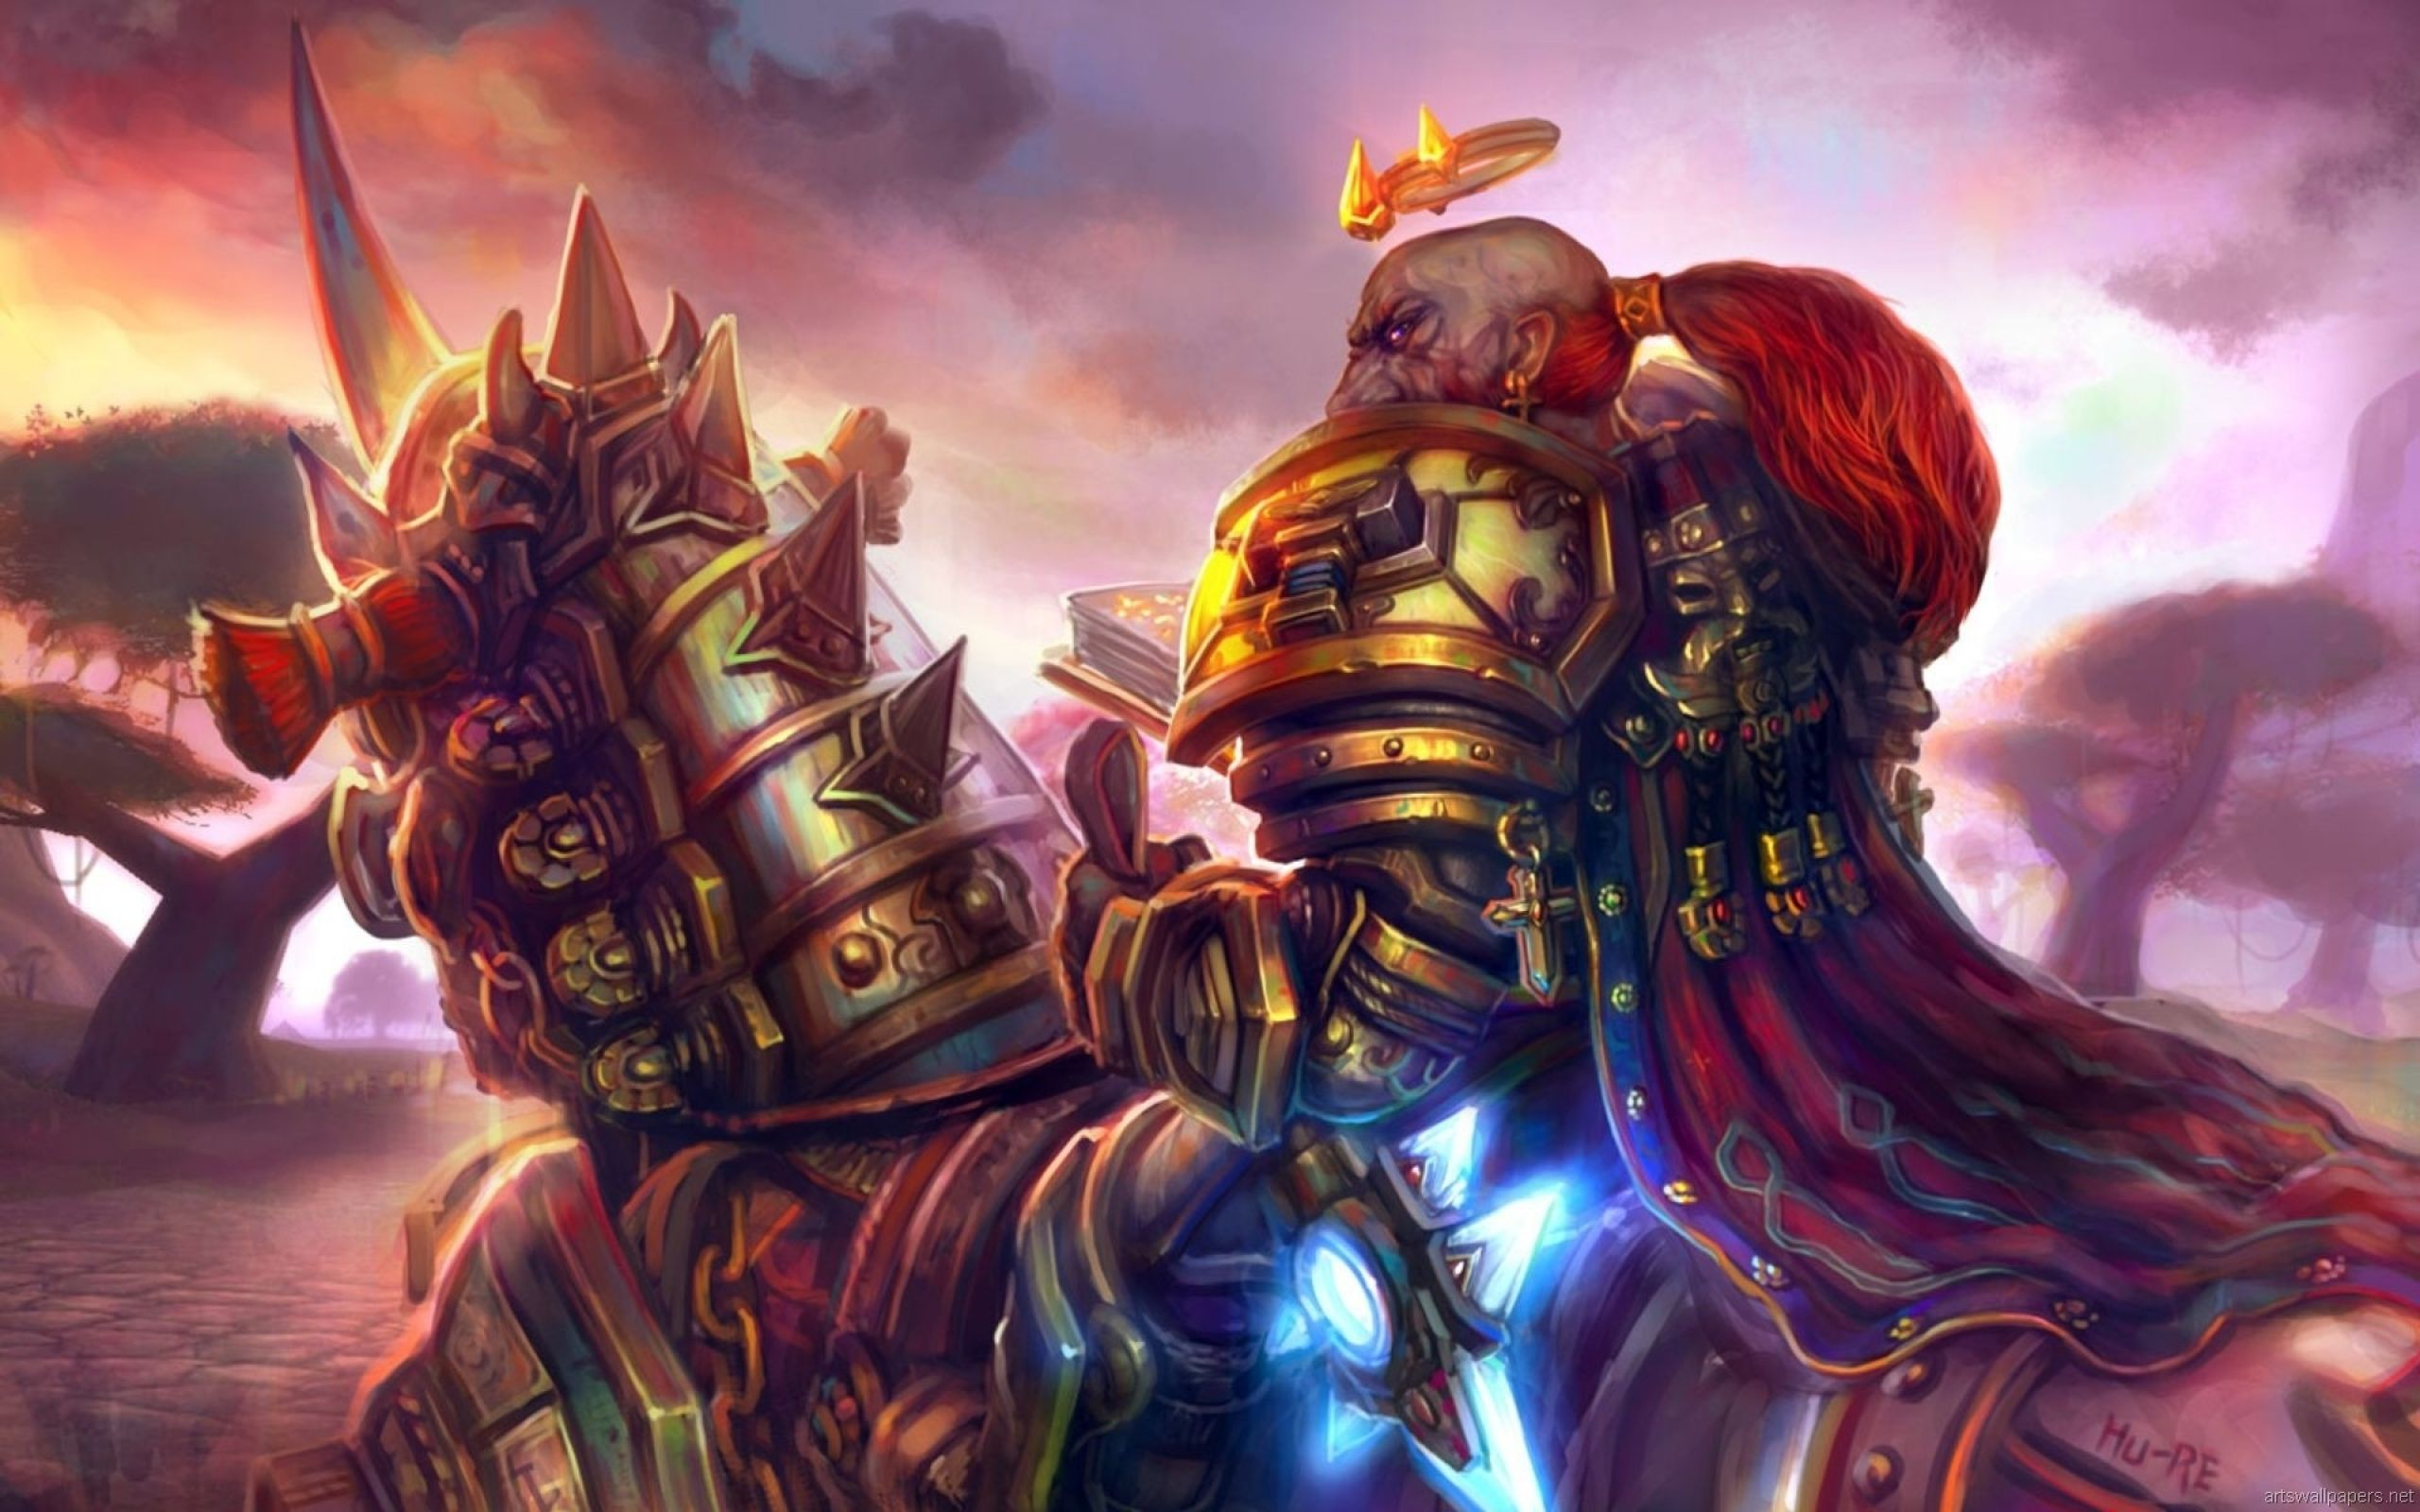 World Of Warcraft Fantasy Art Dwarfs Paladin Warriors 1920x1200 Wallpaper High Resolution Wallpaper Dwarf Paladin World Of Warcraft Warriors Wallpaper